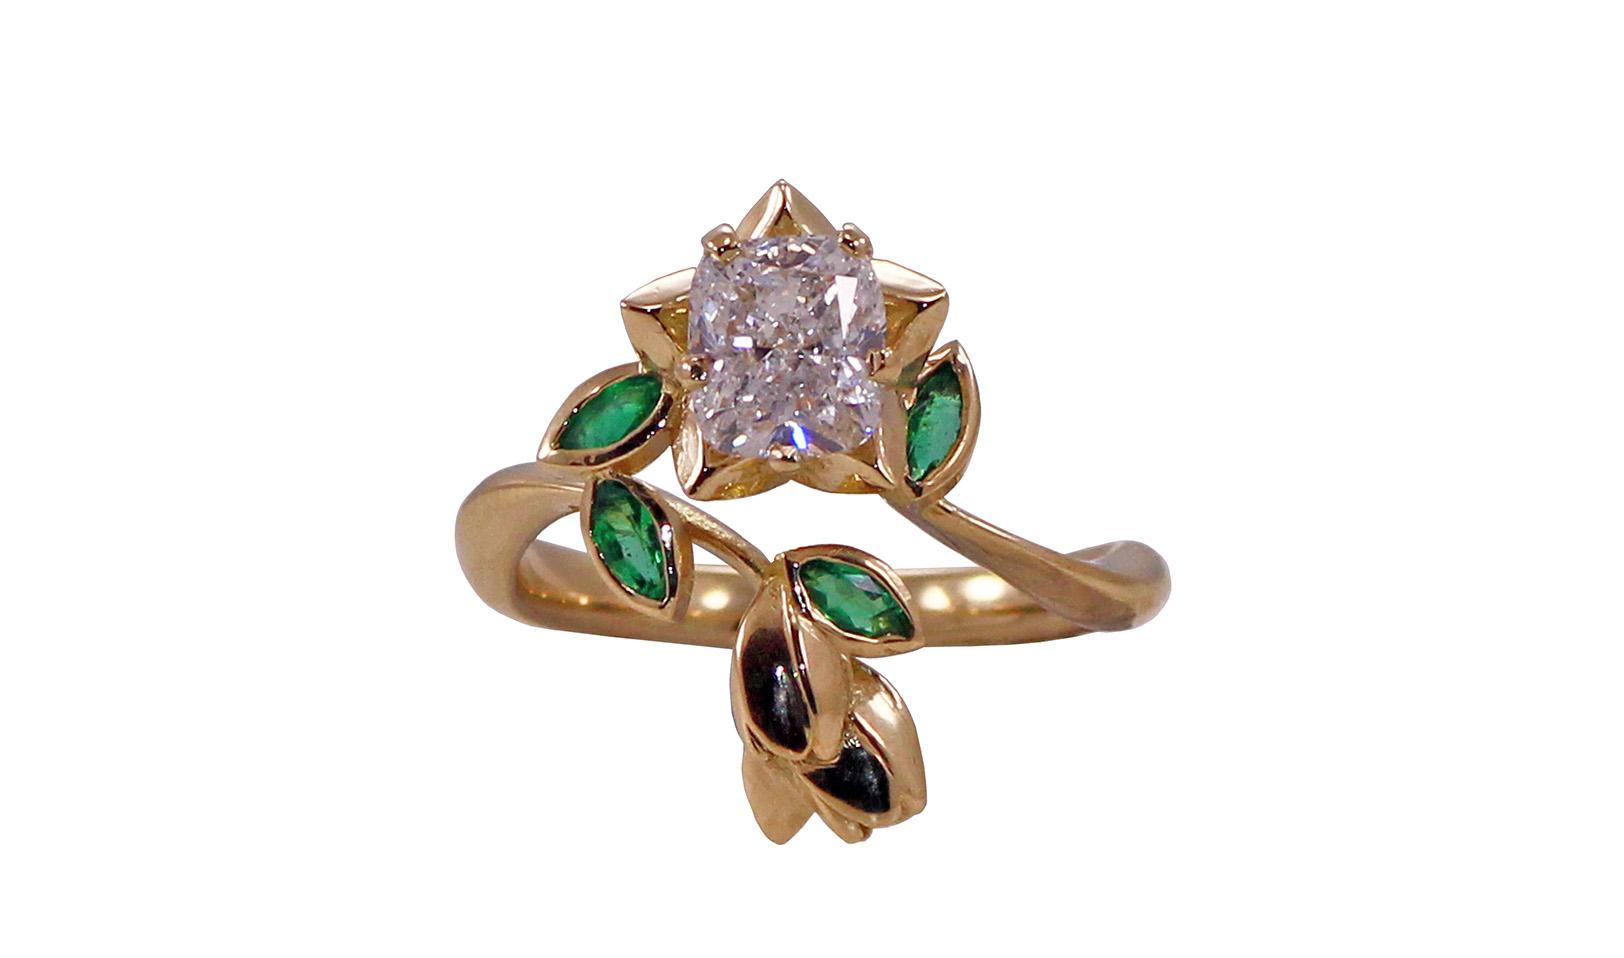 Cushion Cut Diamond Flower Ring with Emeralds